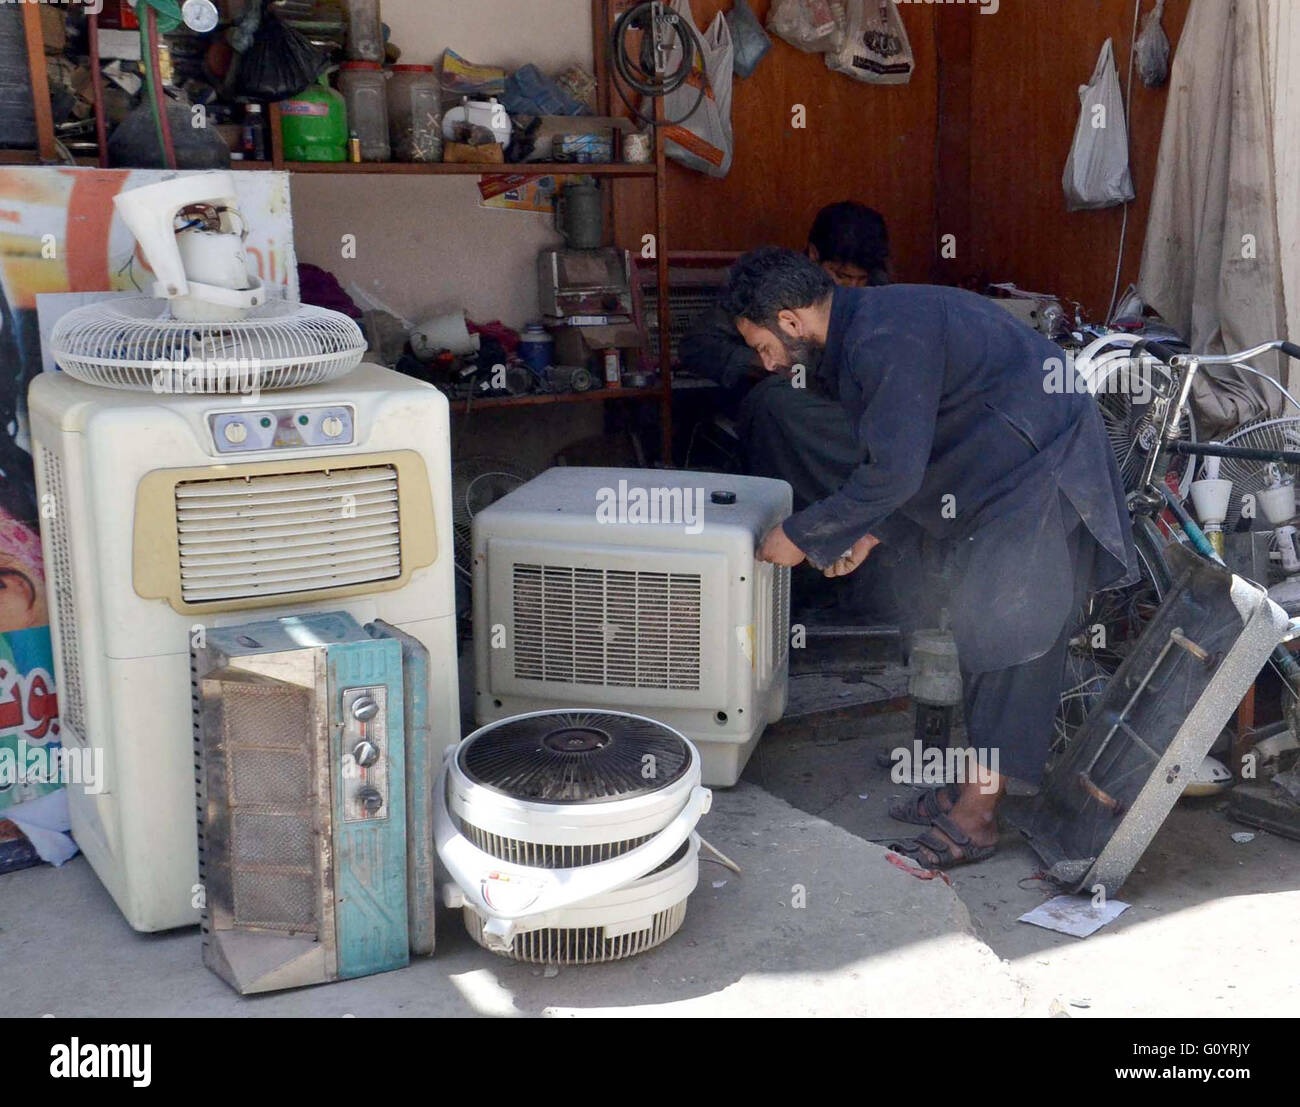 Summer Coolers Stockfotos & Summer Coolers Bilder - Alamy